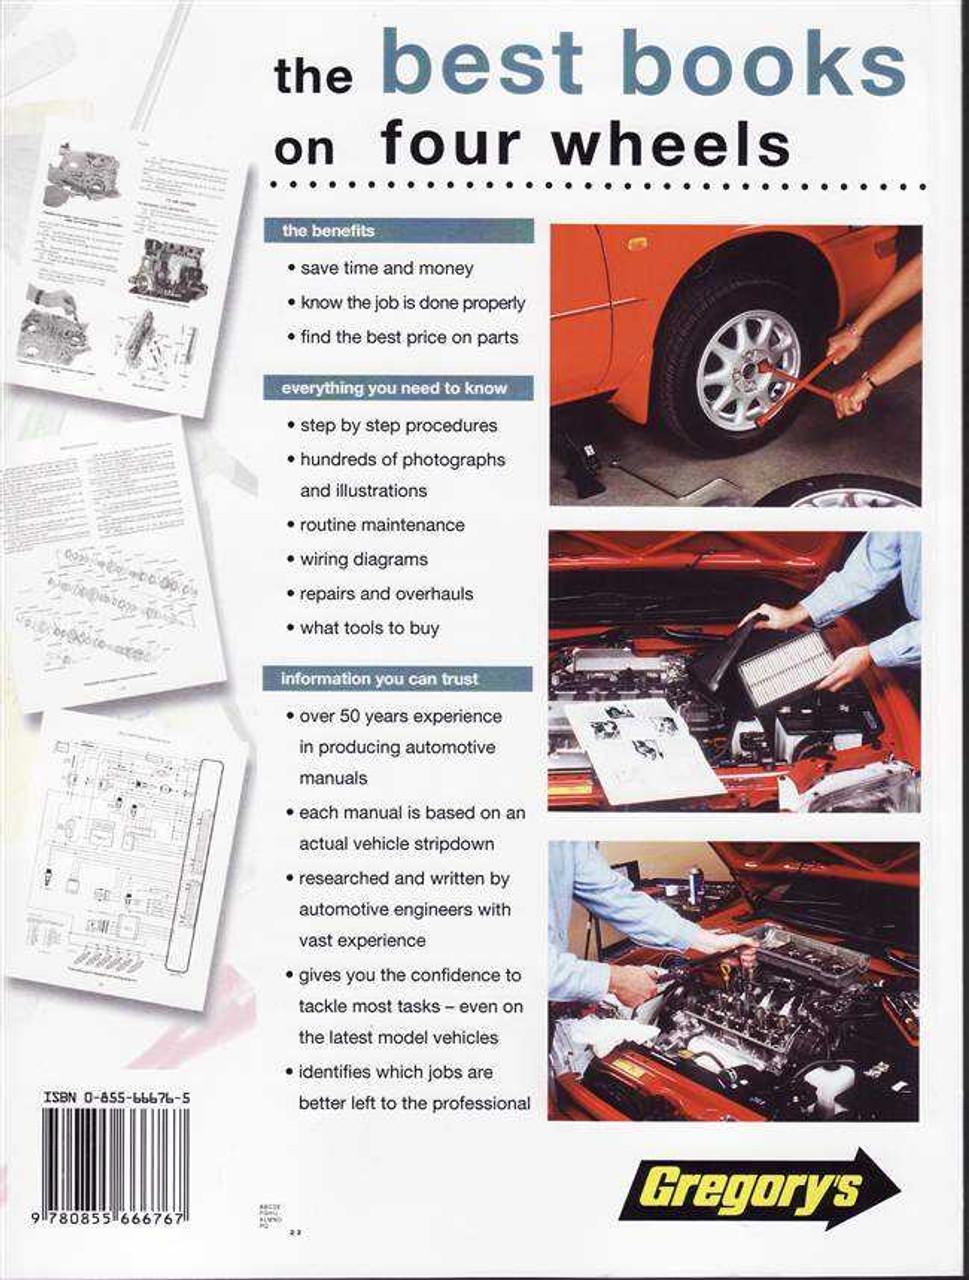 acer b243pwl manual ebook on